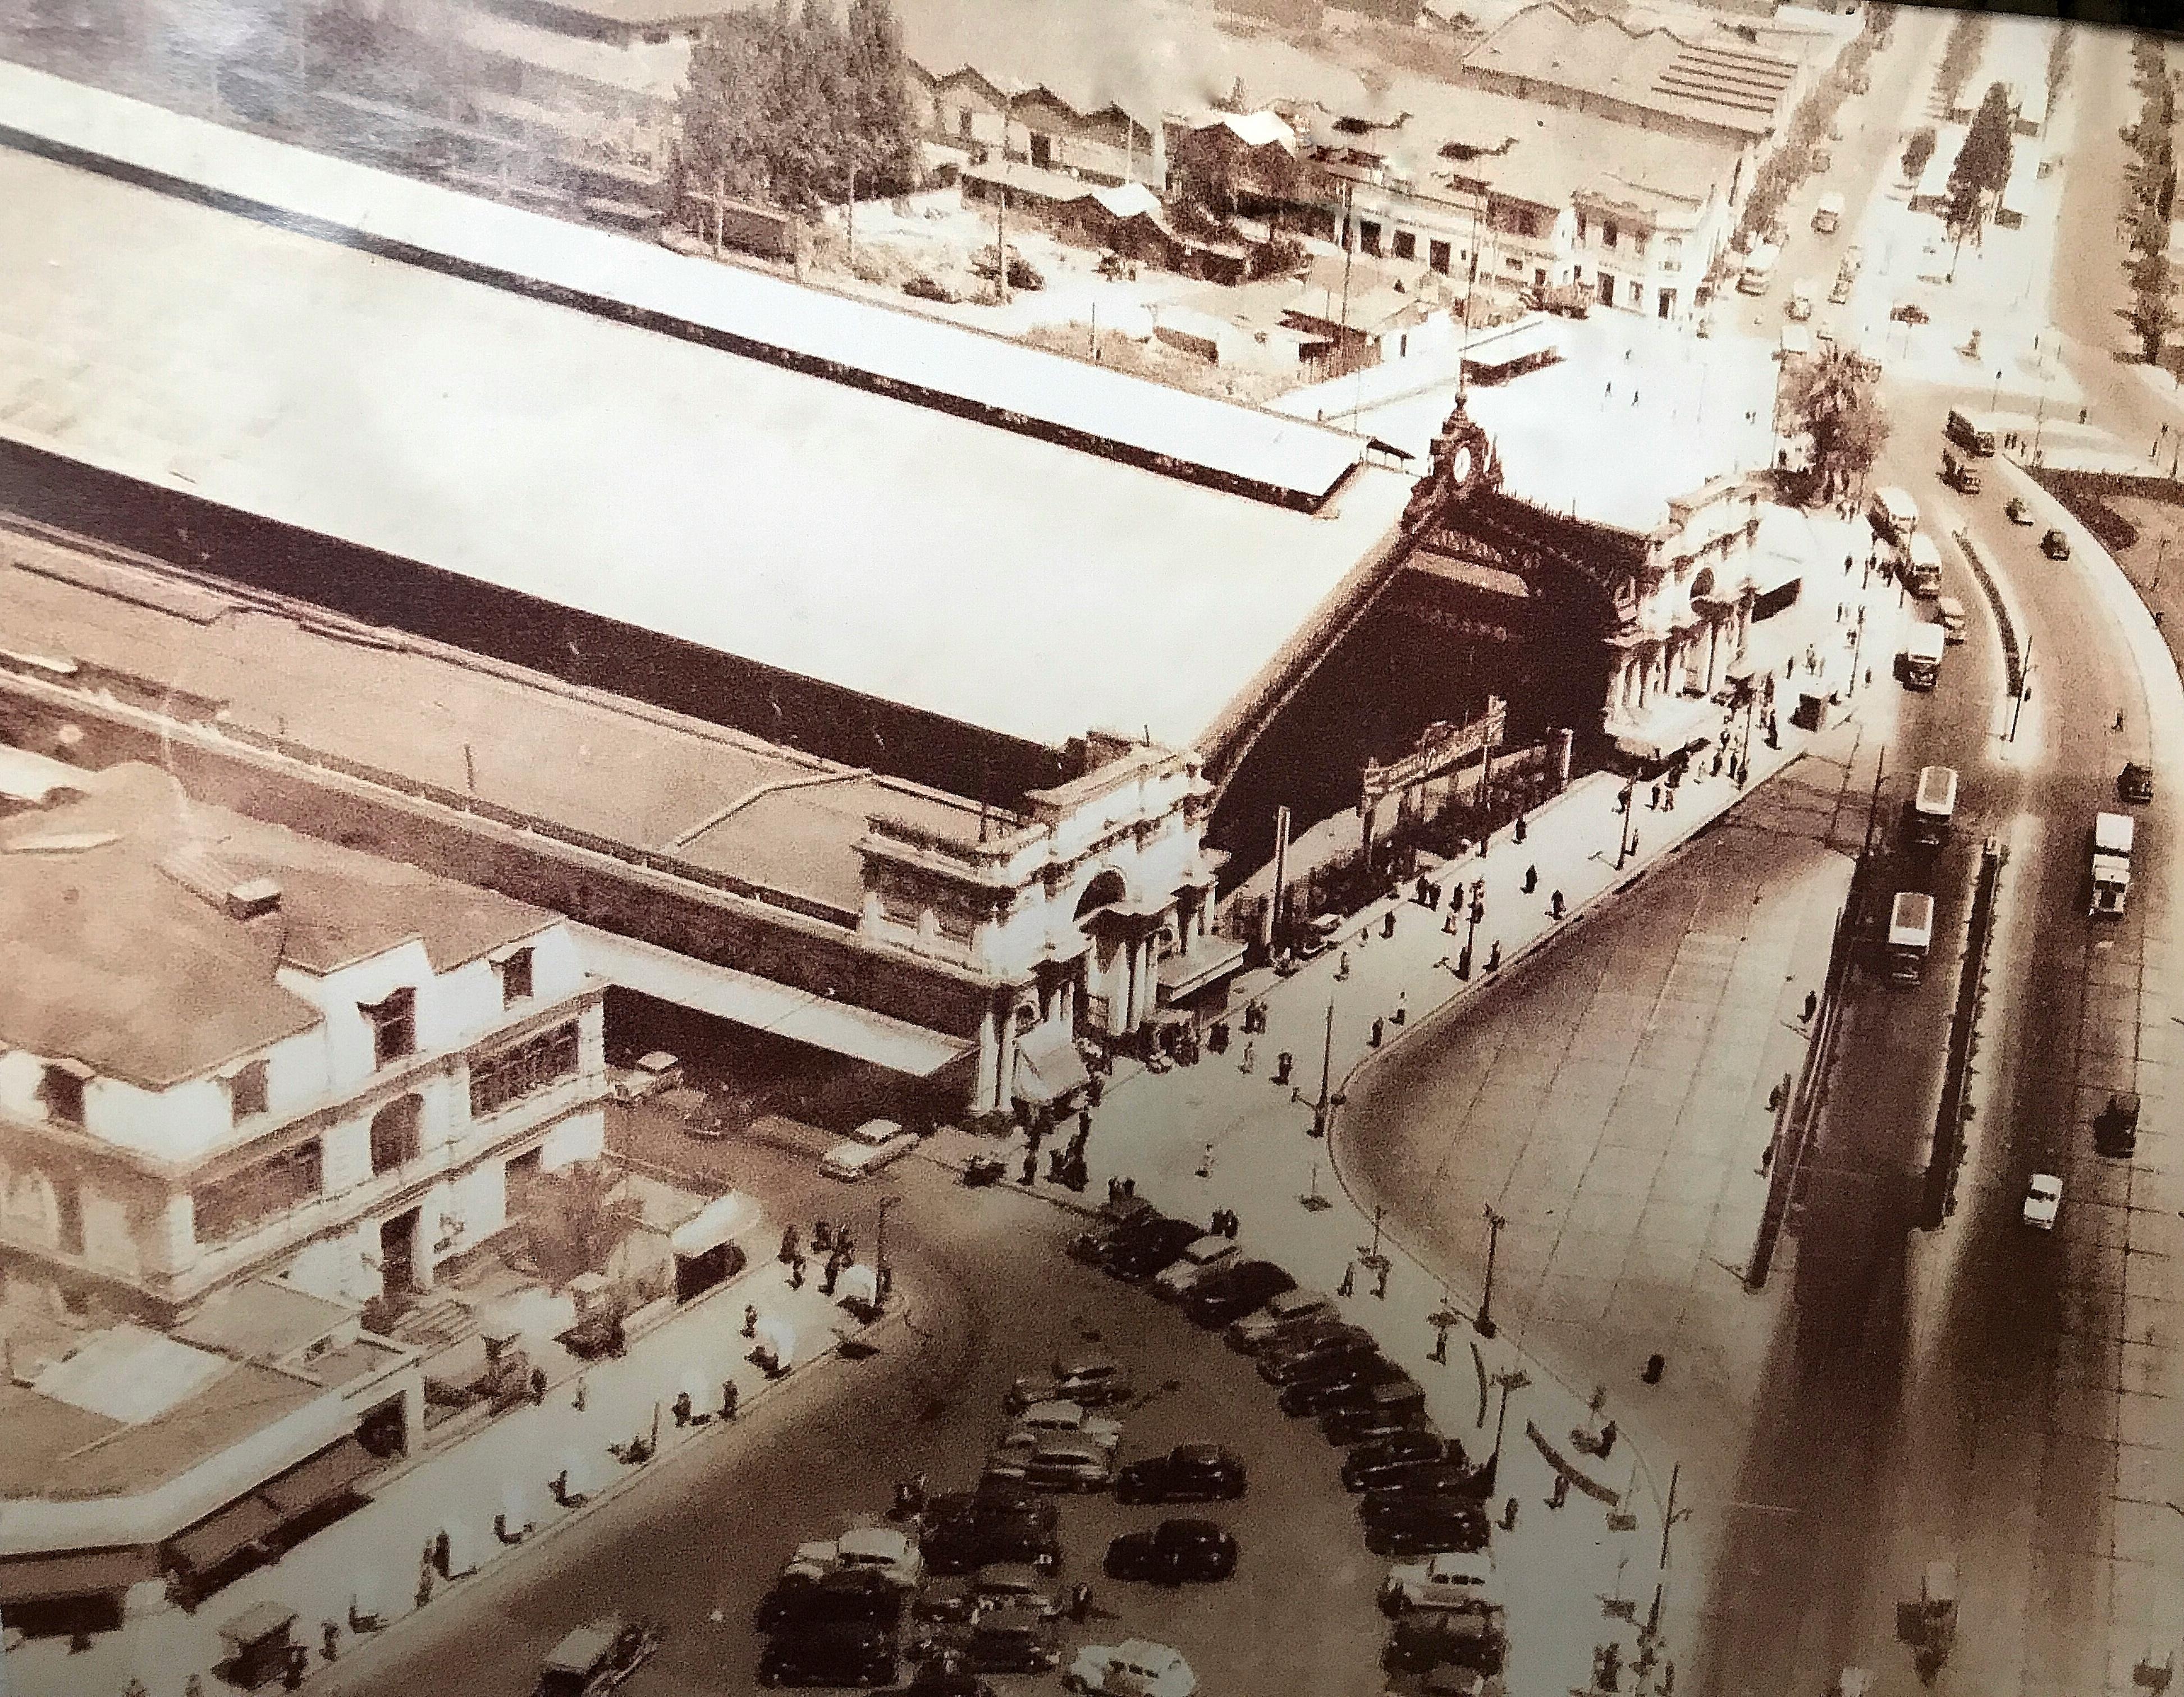 Enterreno - Fotos históricas de chile - fotos antiguas de Chile - Estación Central en 1930